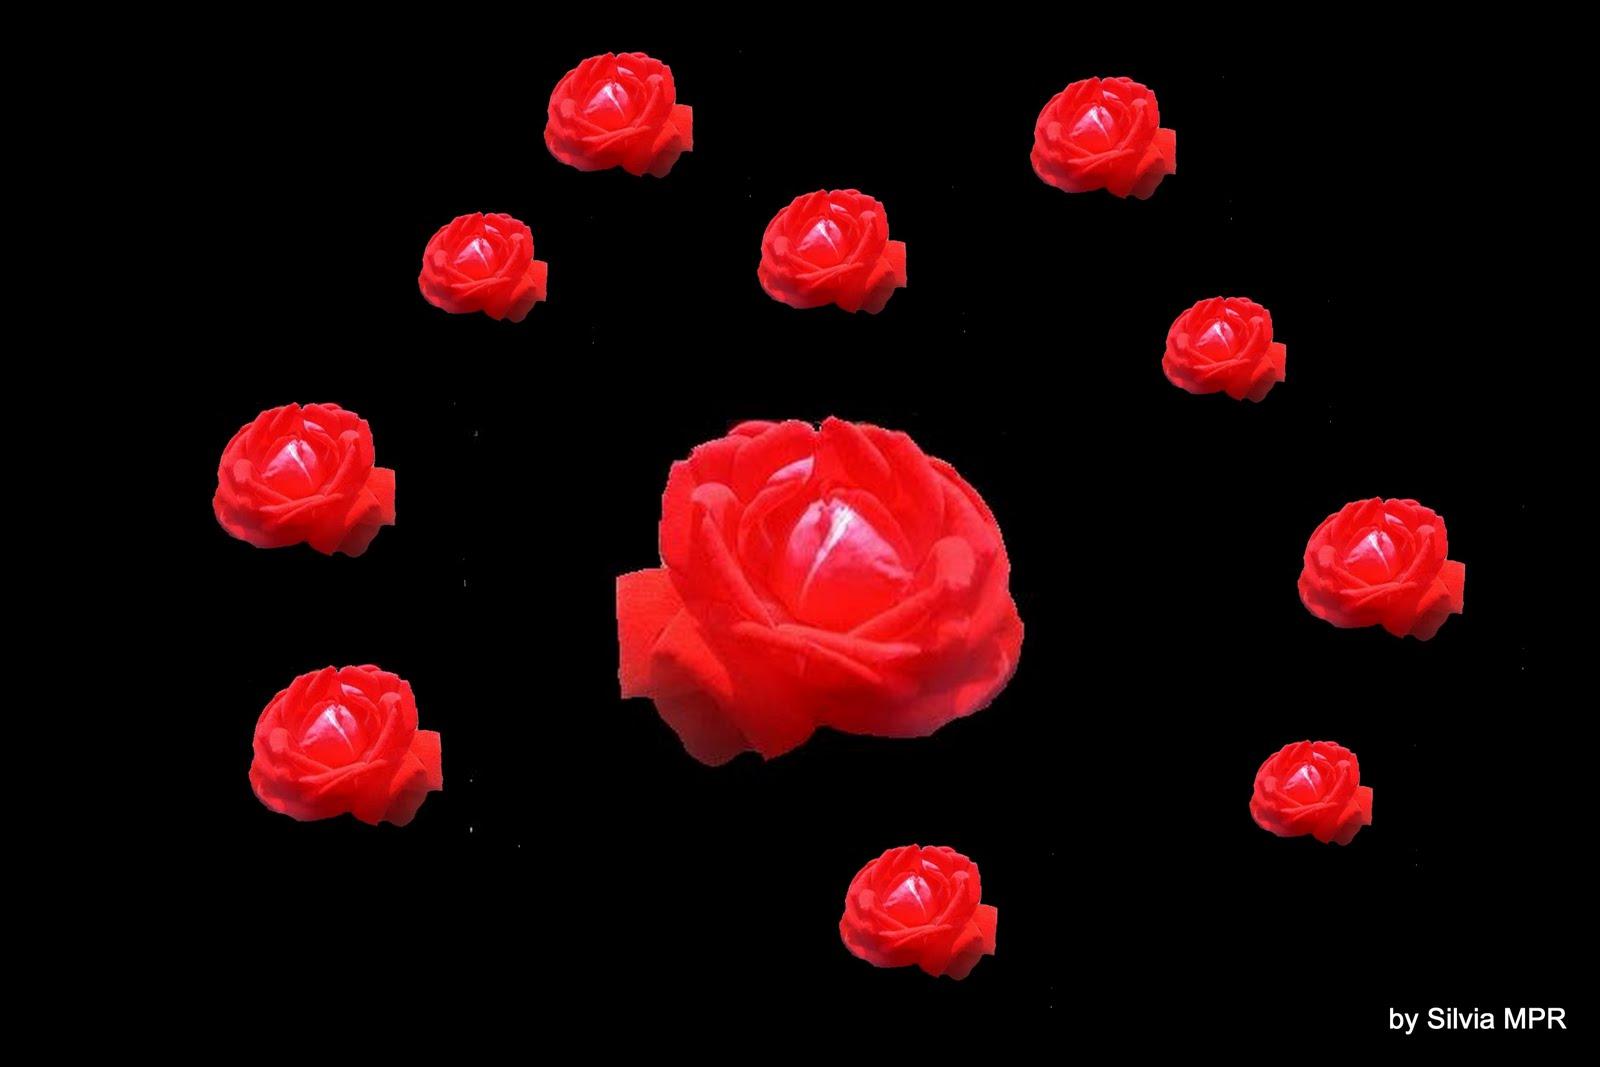 http://4.bp.blogspot.com/_epxNW-l6NdI/S7uP3yqzO7I/AAAAAAAALmE/meeDqzS1SLE/s1600/flores+rosas+rojas+wallpapers+5120x3413.jpg